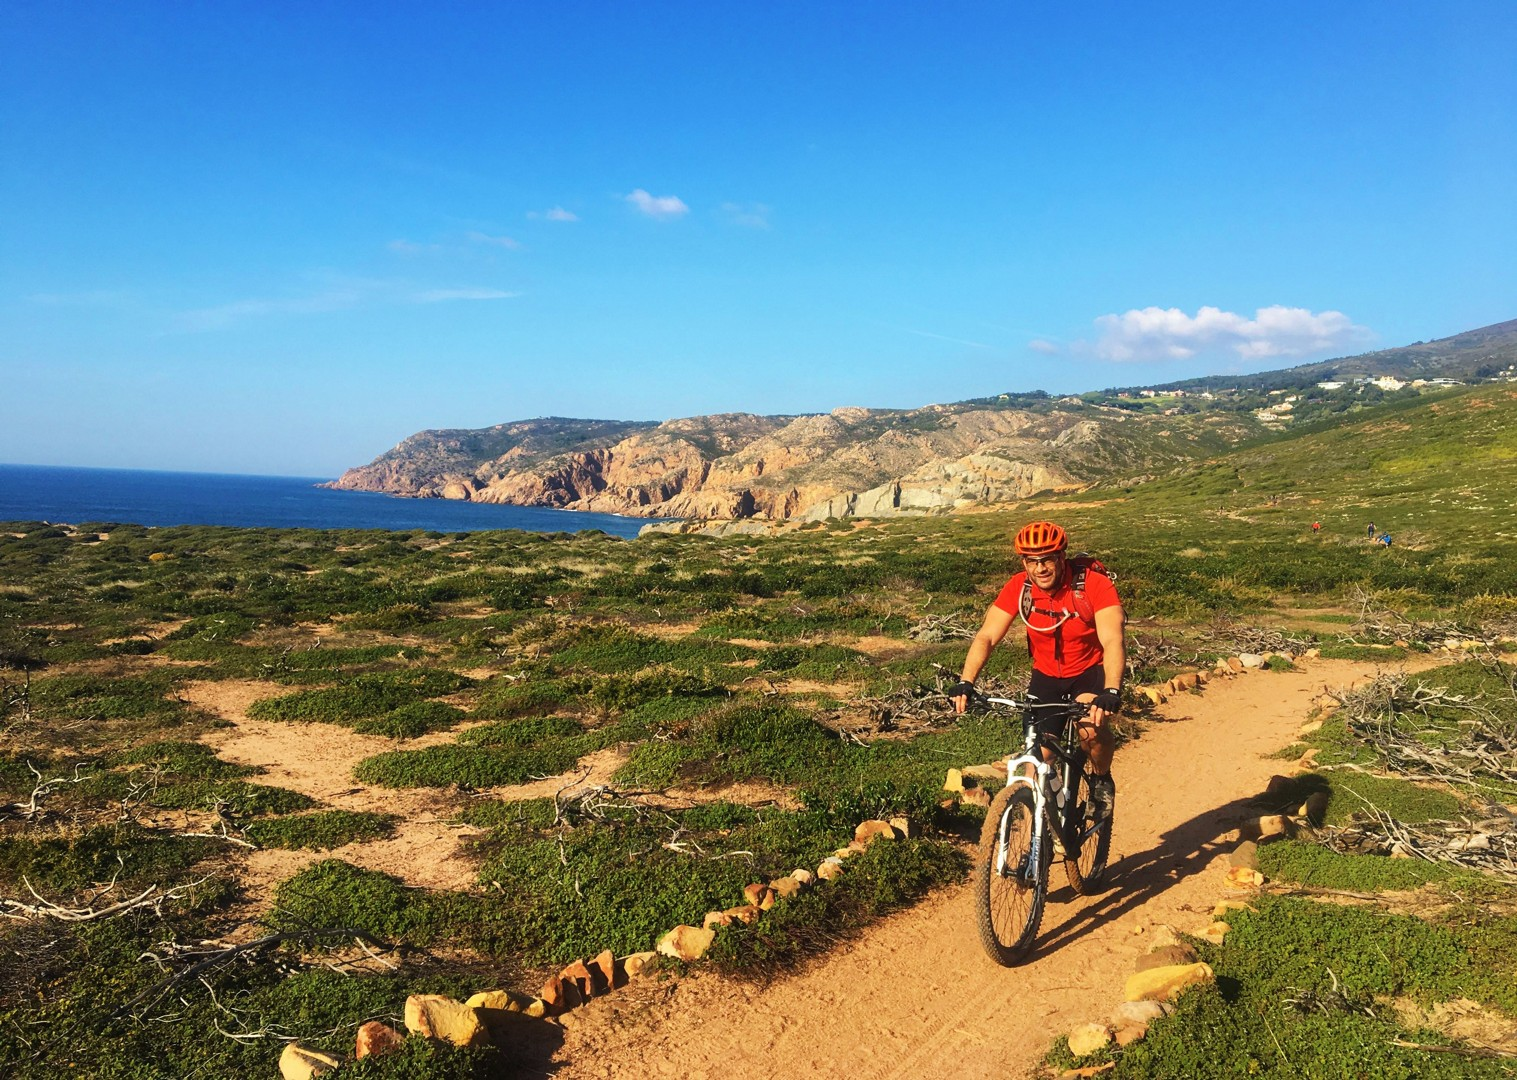 rural-tracks-cycling-holiday-on-atlantic-coast-portugal.jpg - Portugal - Atlantic Trails - Guided Mountain Bike Holiday - Mountain Biking